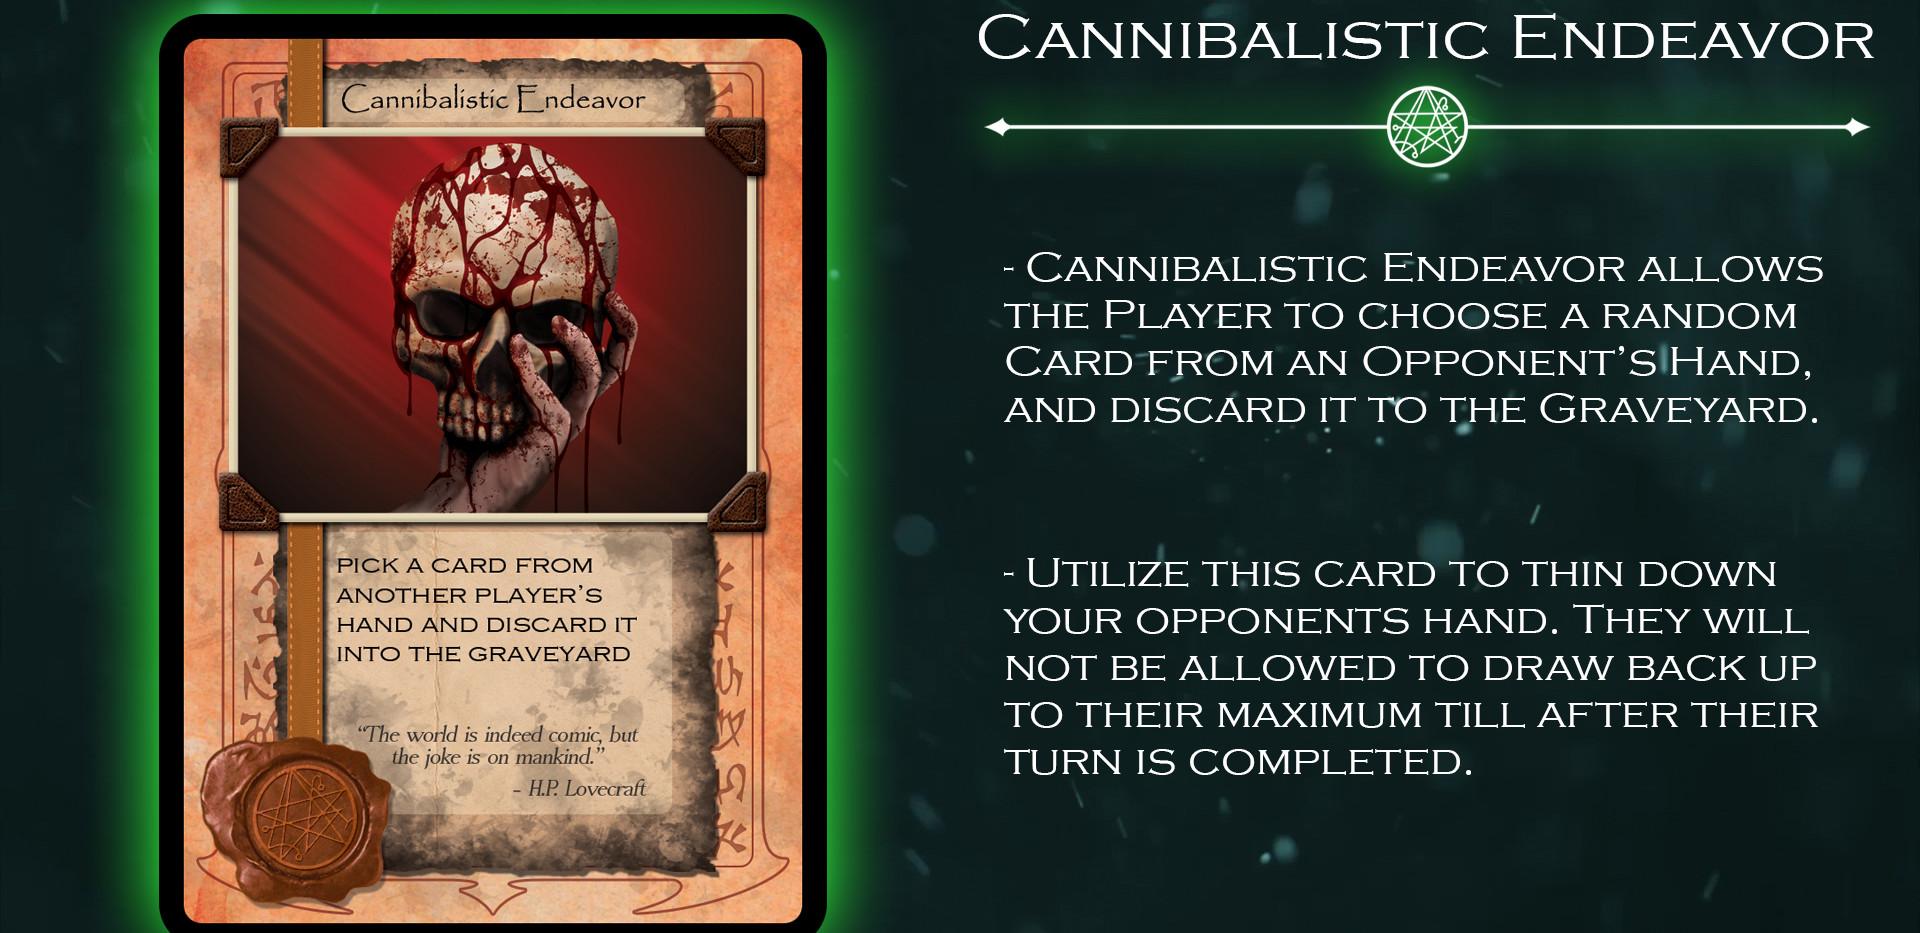 Cannibalistic Endeavor Card